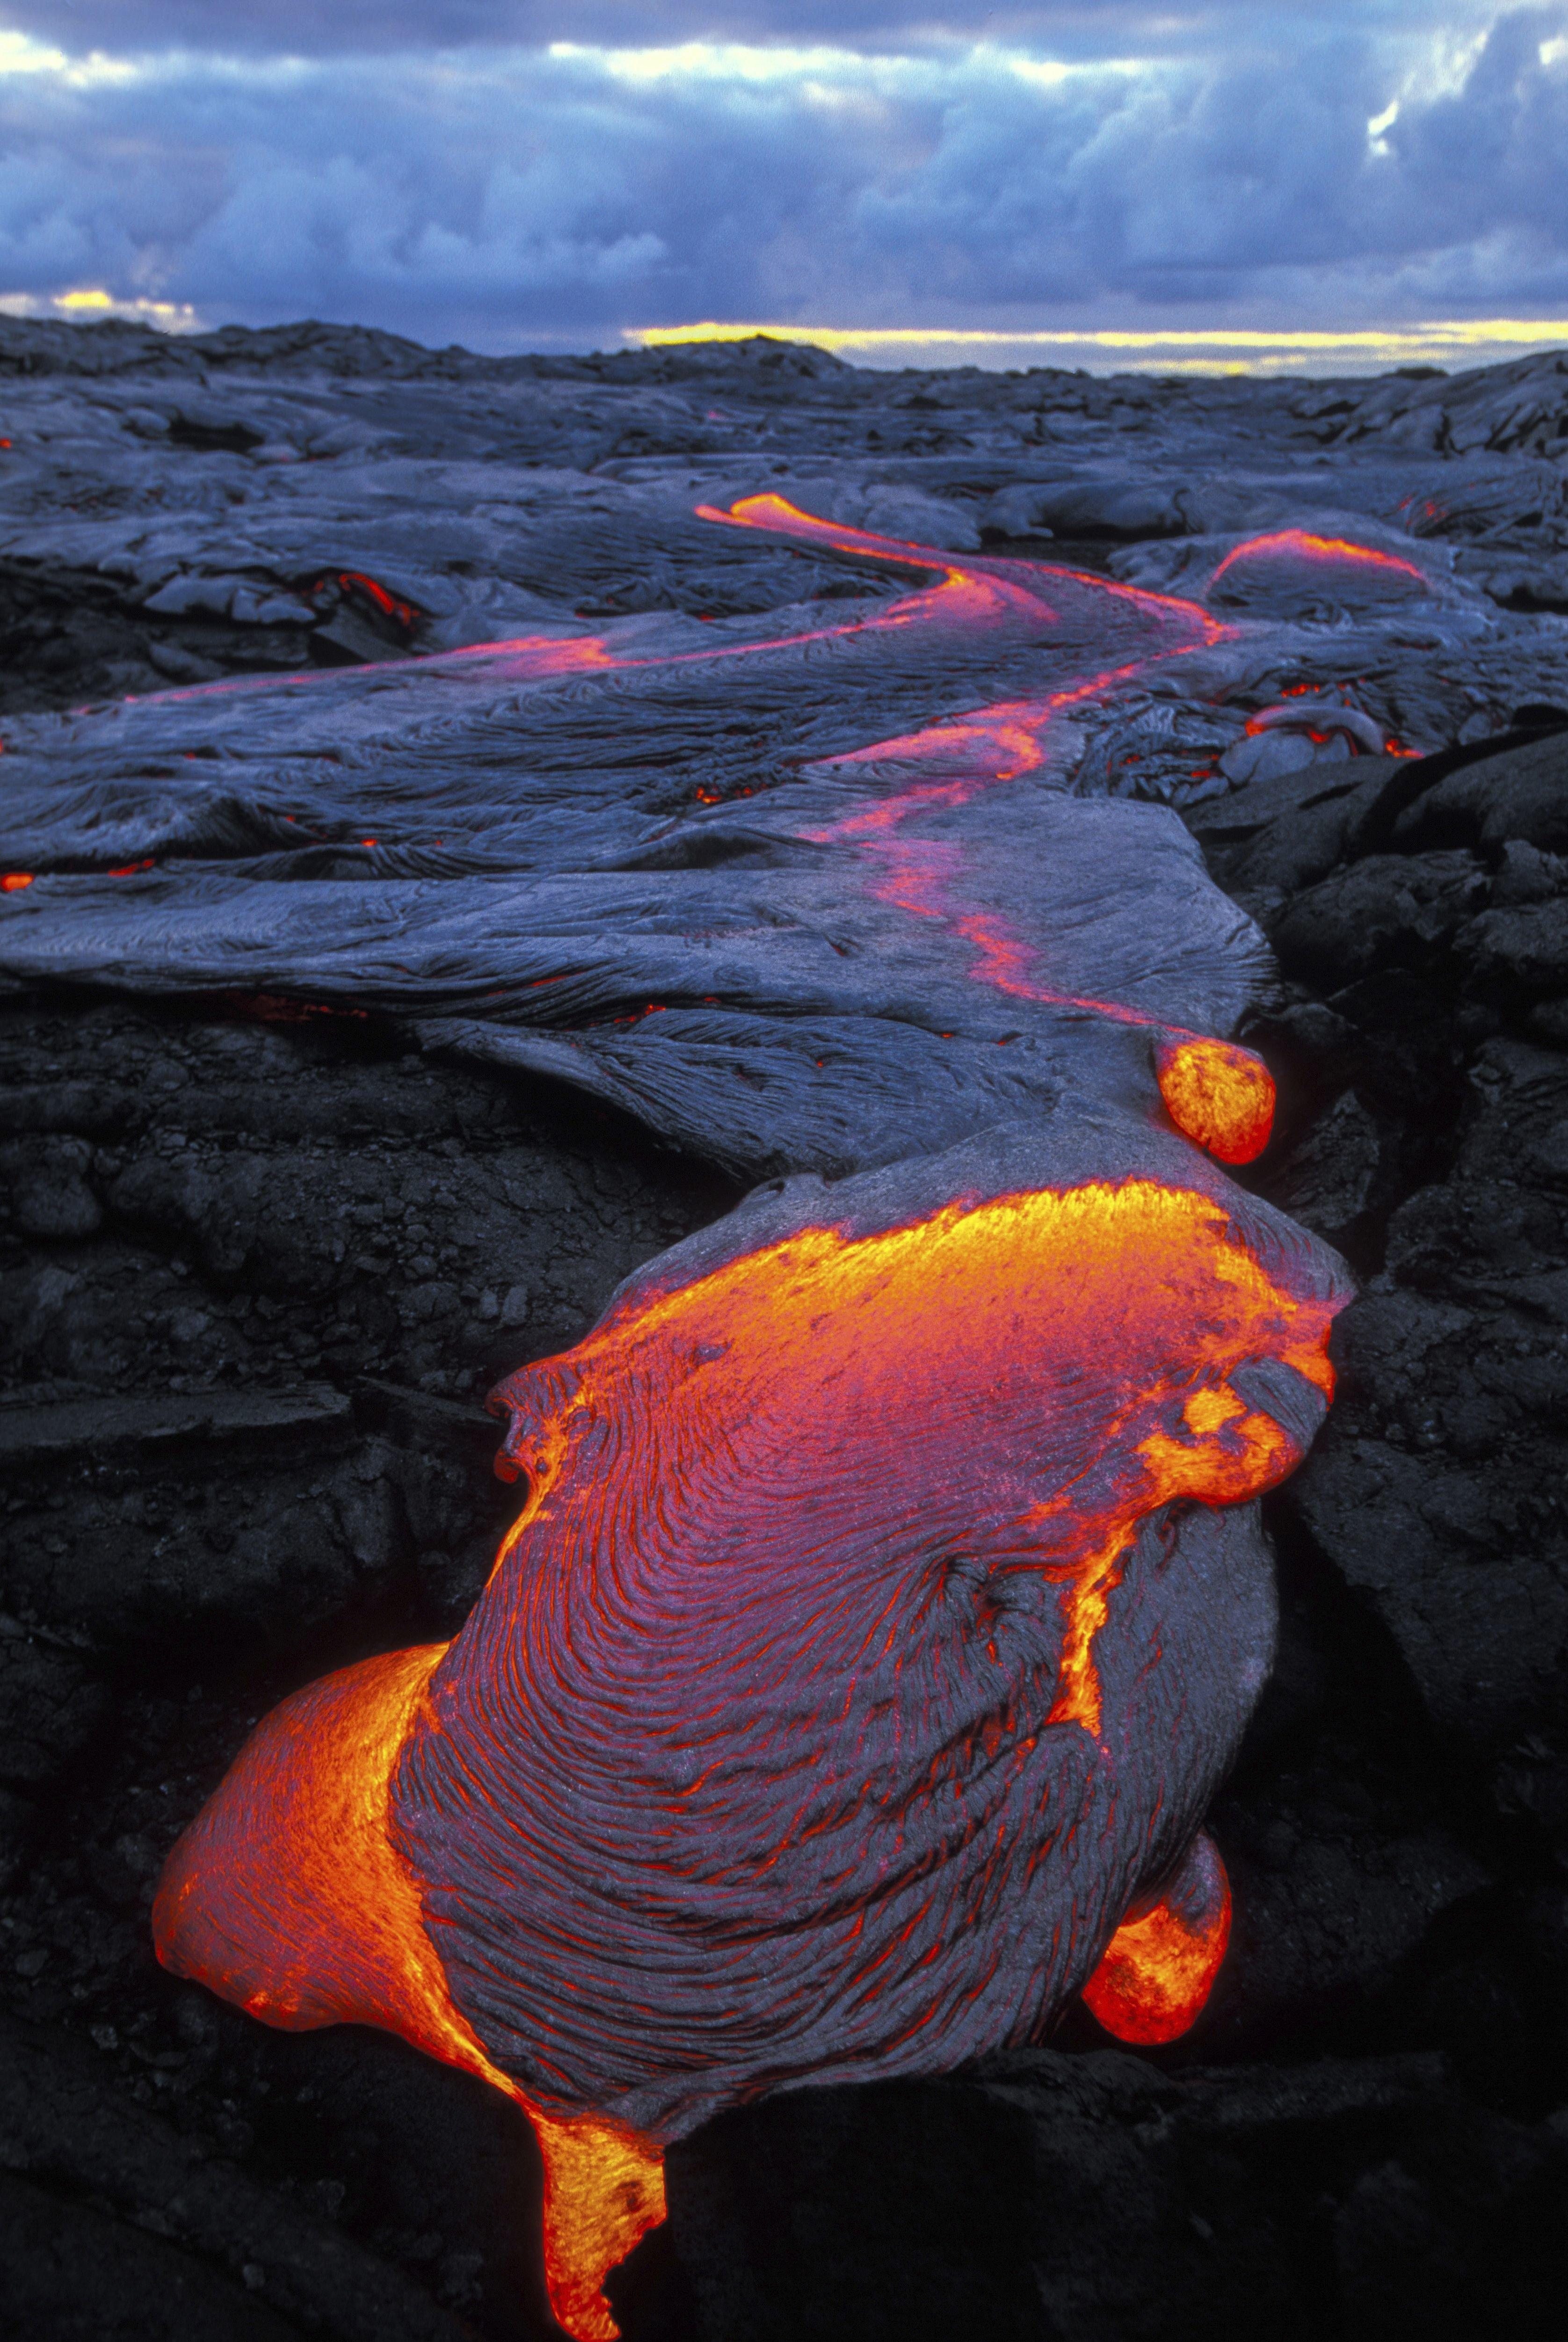 Kitört egy vulkán Hawaiin